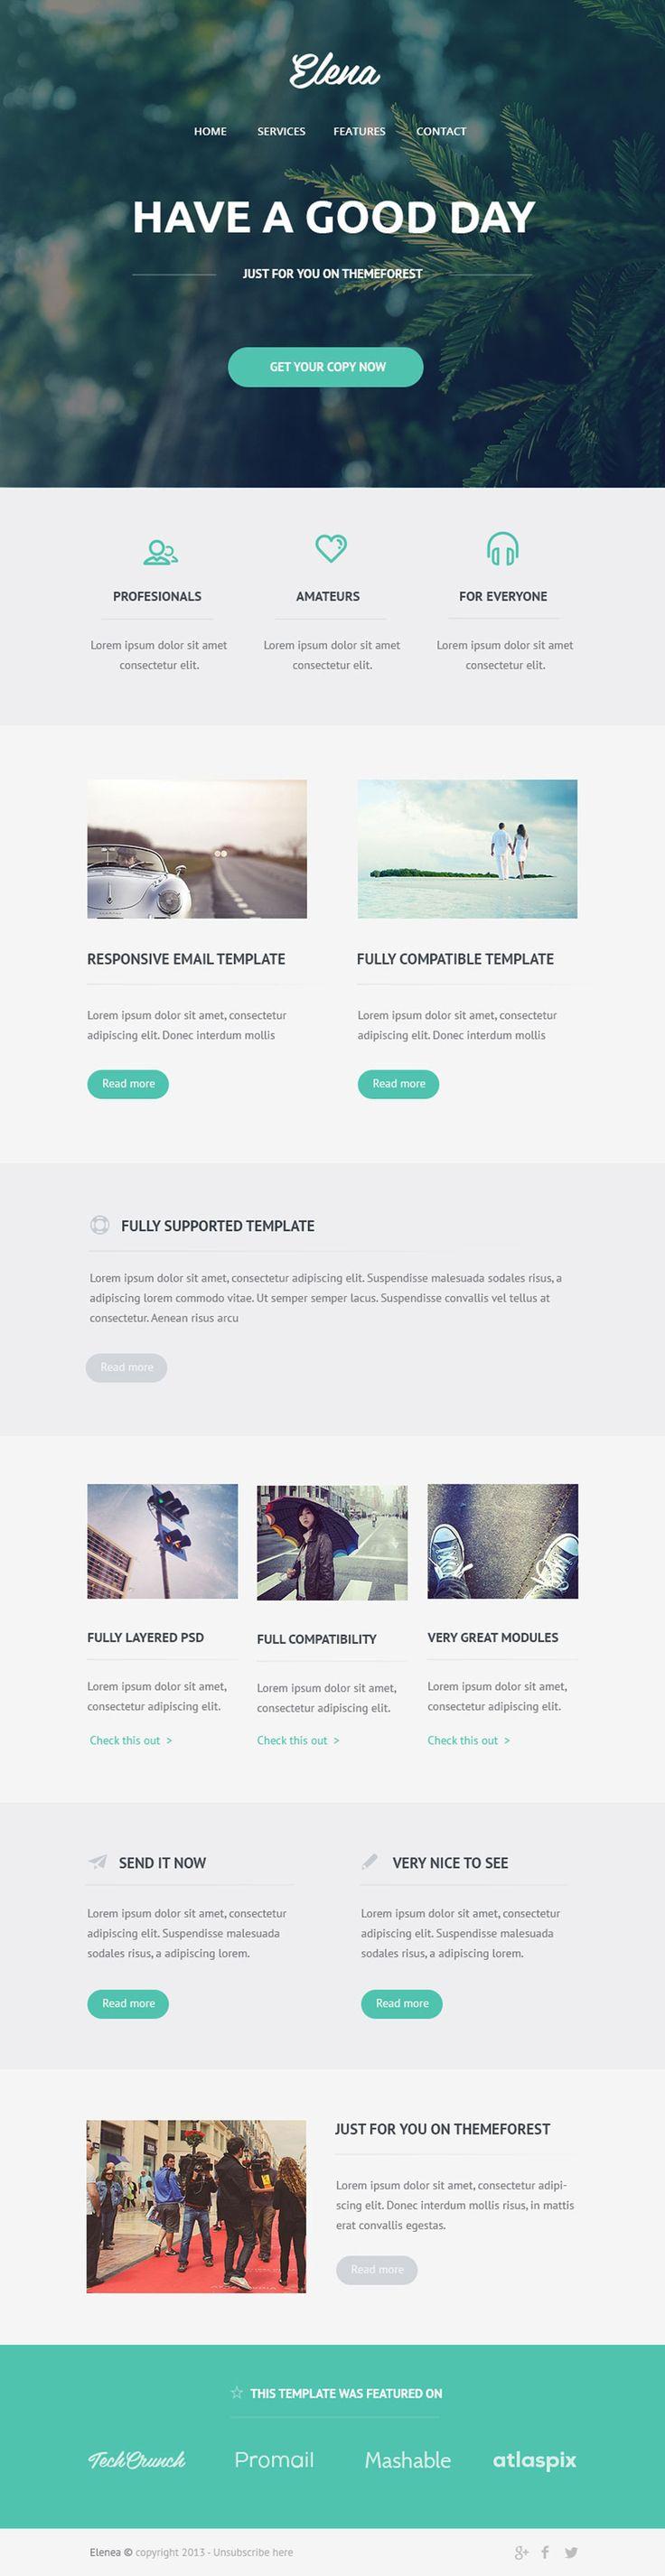 100+ Latest Free Web Page Templates PSD